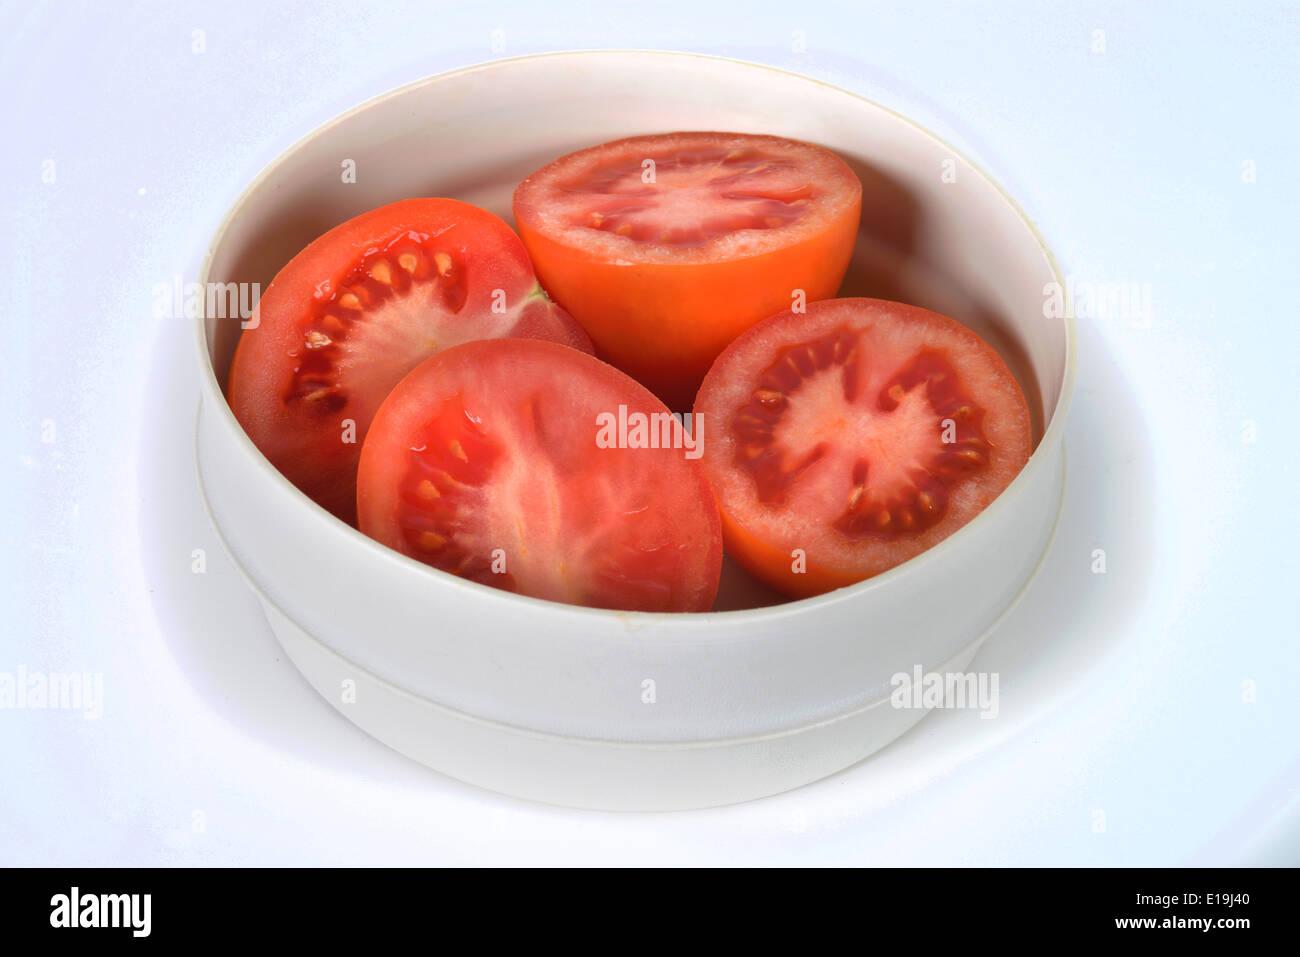 tomatoes tomato - Stock Image